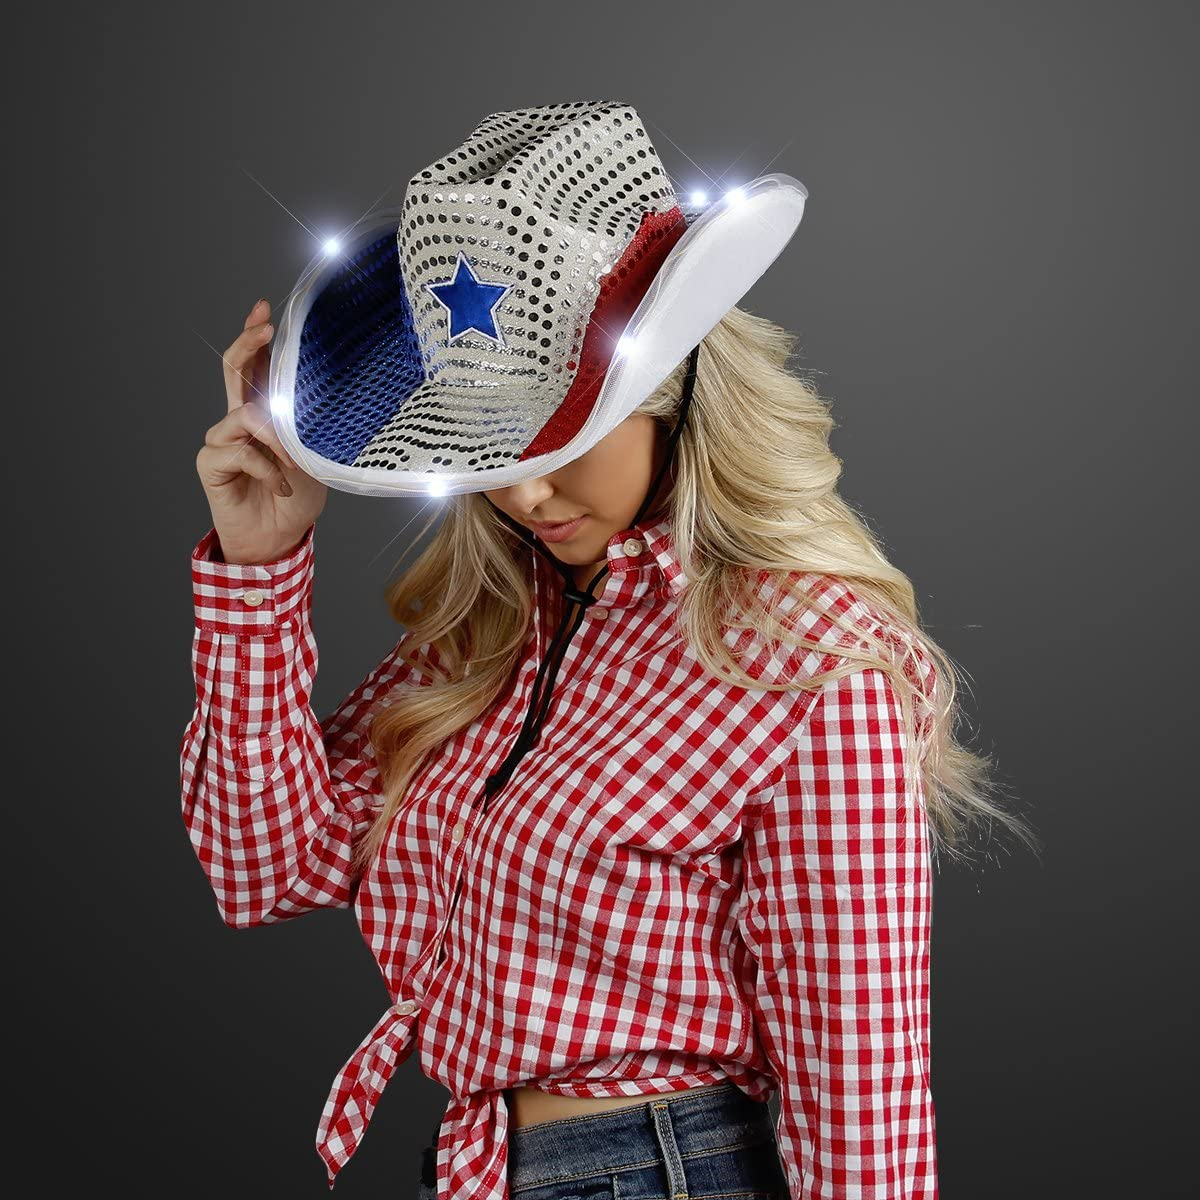 Details about  /Led Hat Cowboy Party Cap RED Sequin Flashing Light Up Party Hat Dancer Favors